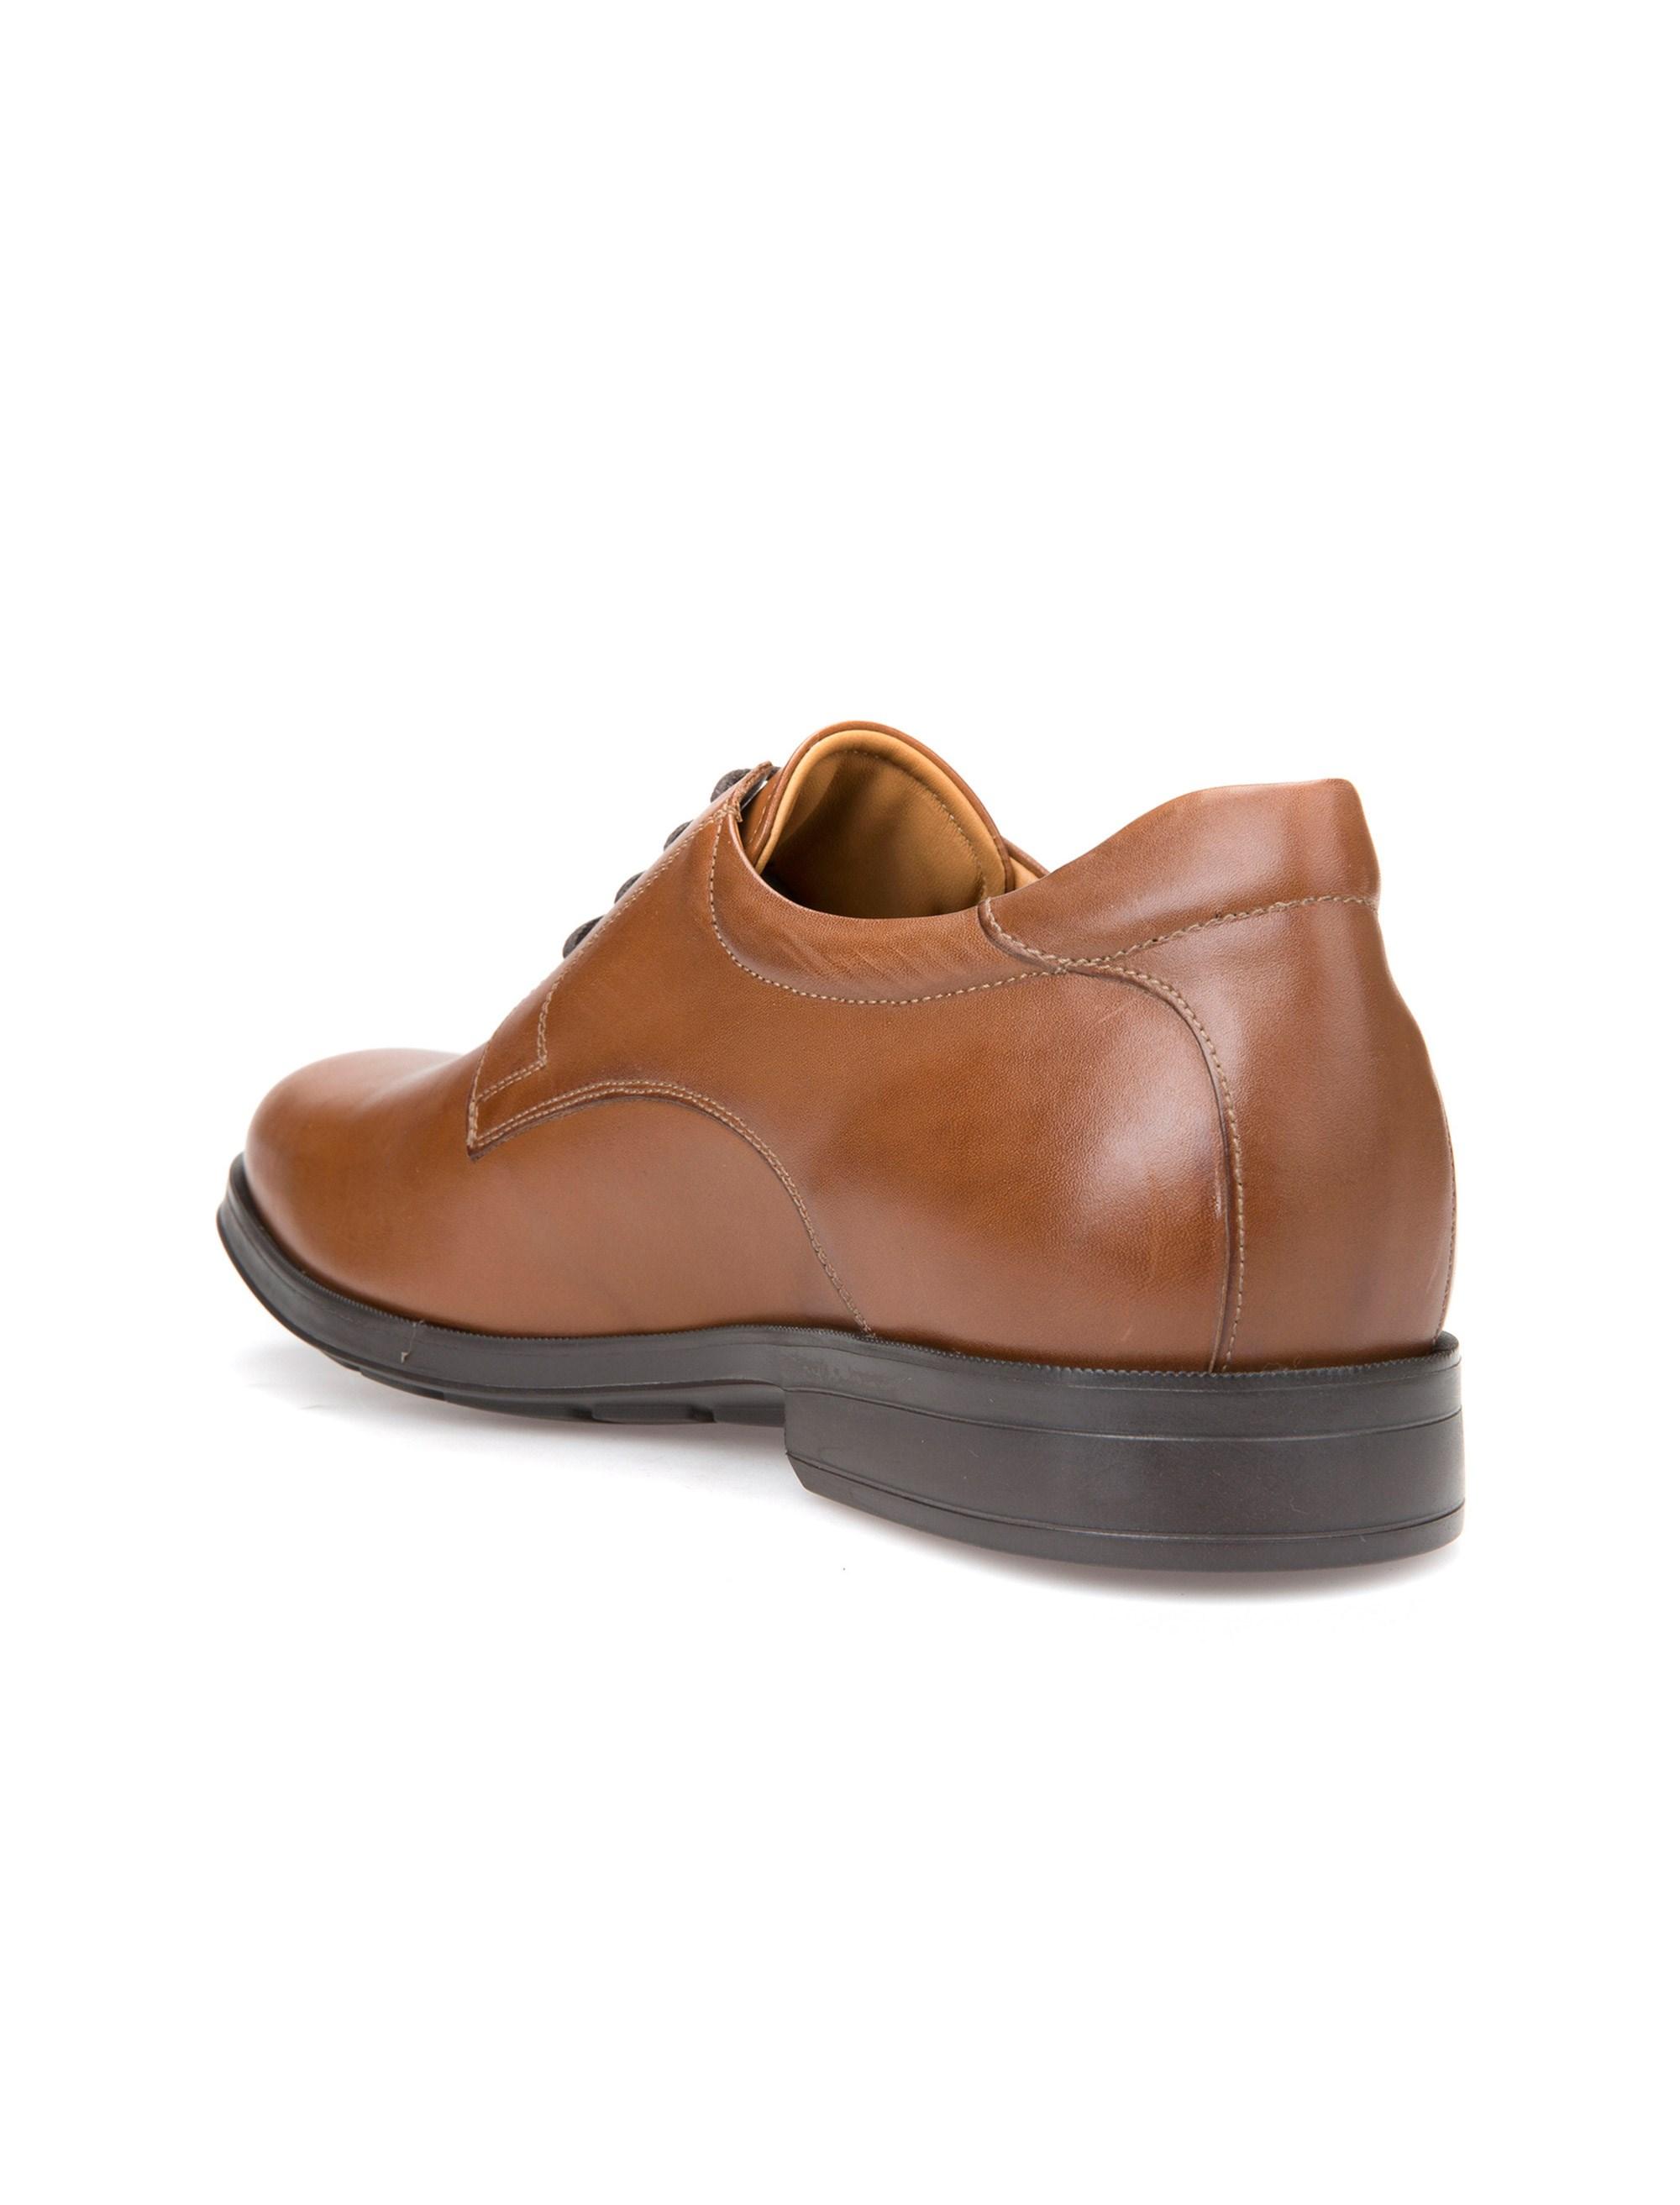 کفش اداری چرم مردانه Hilstone - جی اوکس - قهوه اي  - 5